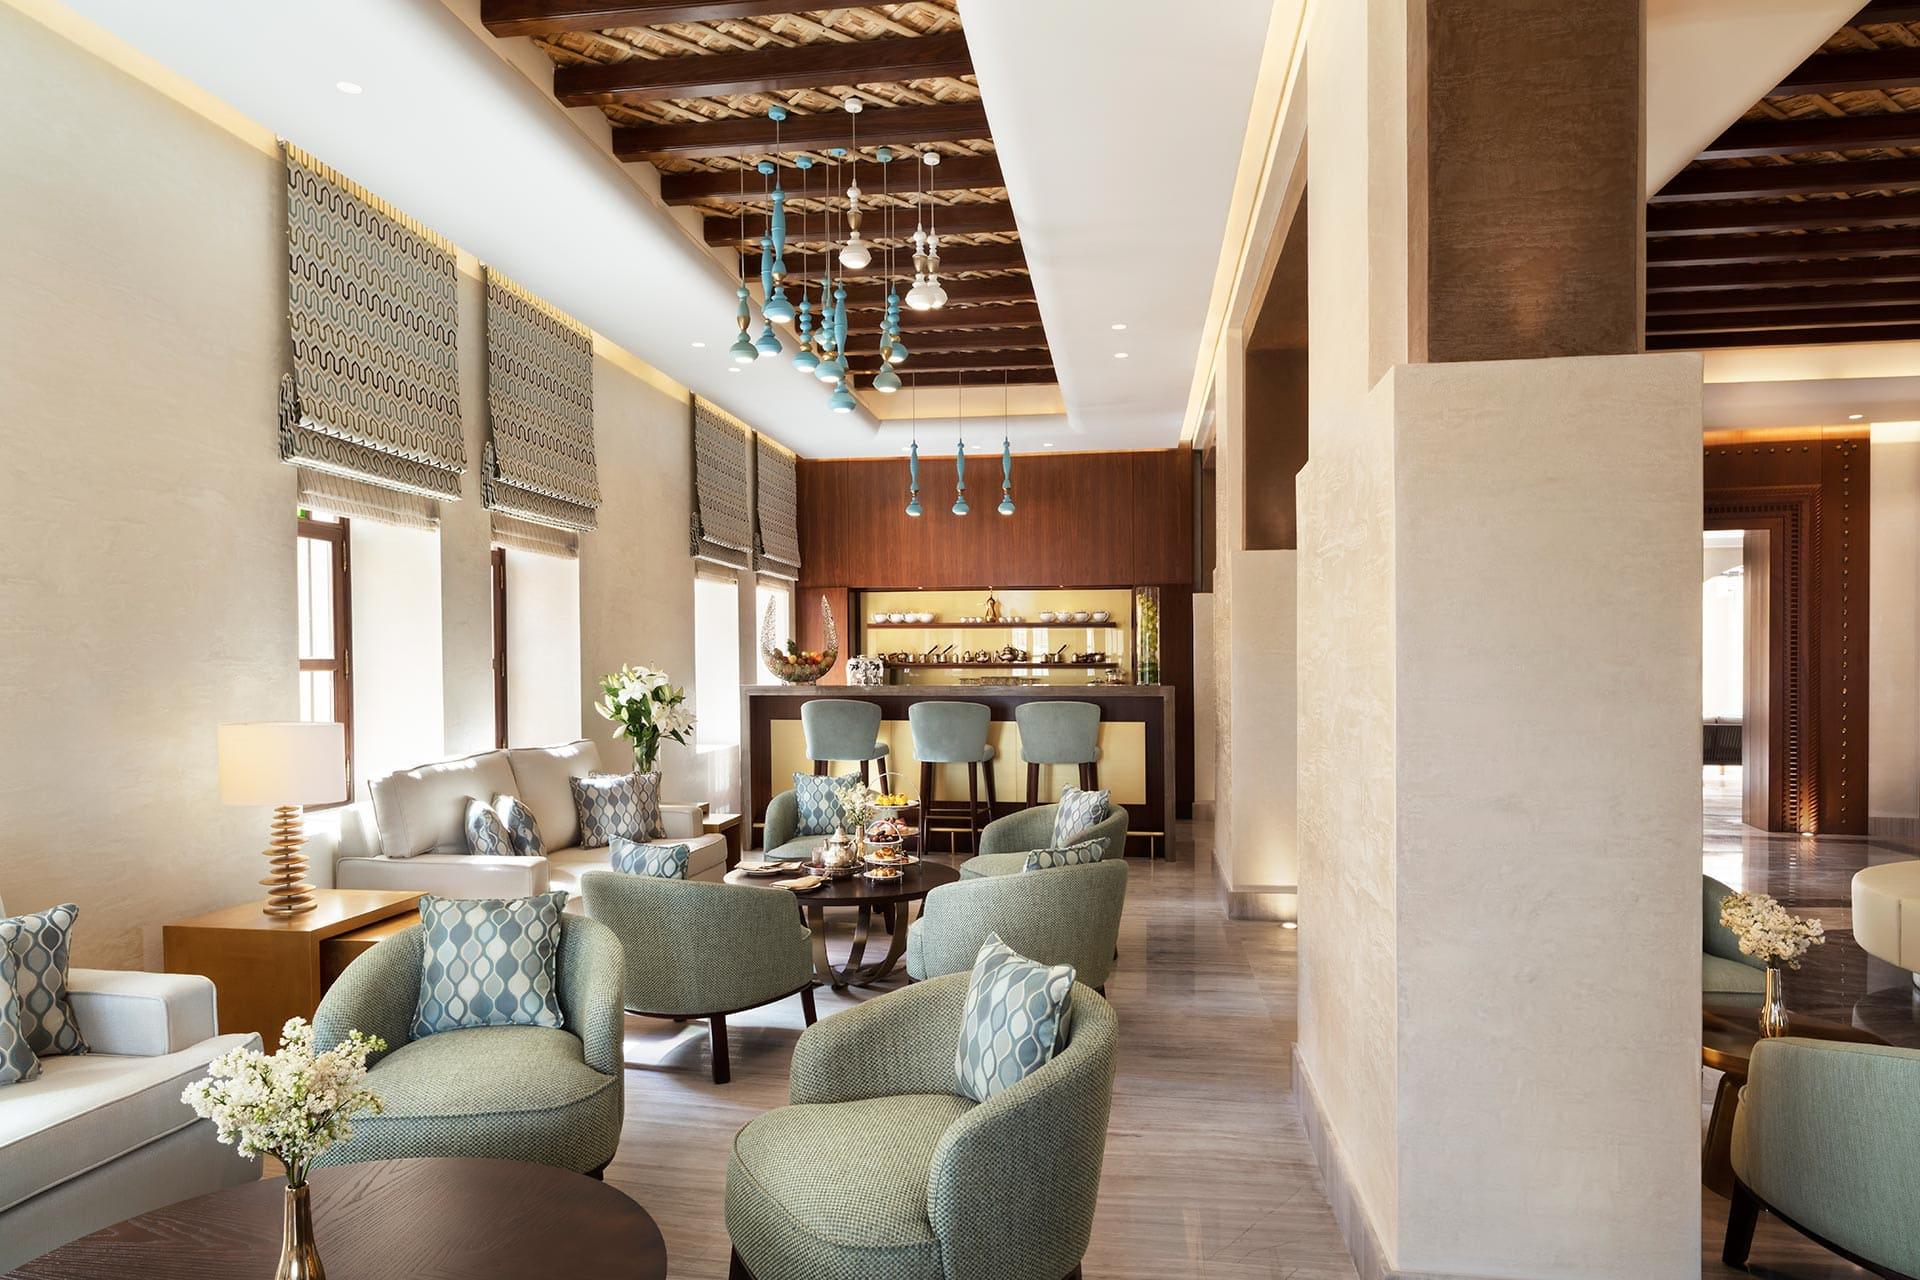 Souq Al Wakra Hotel Qatar by Tivoli - Lobby Lounge